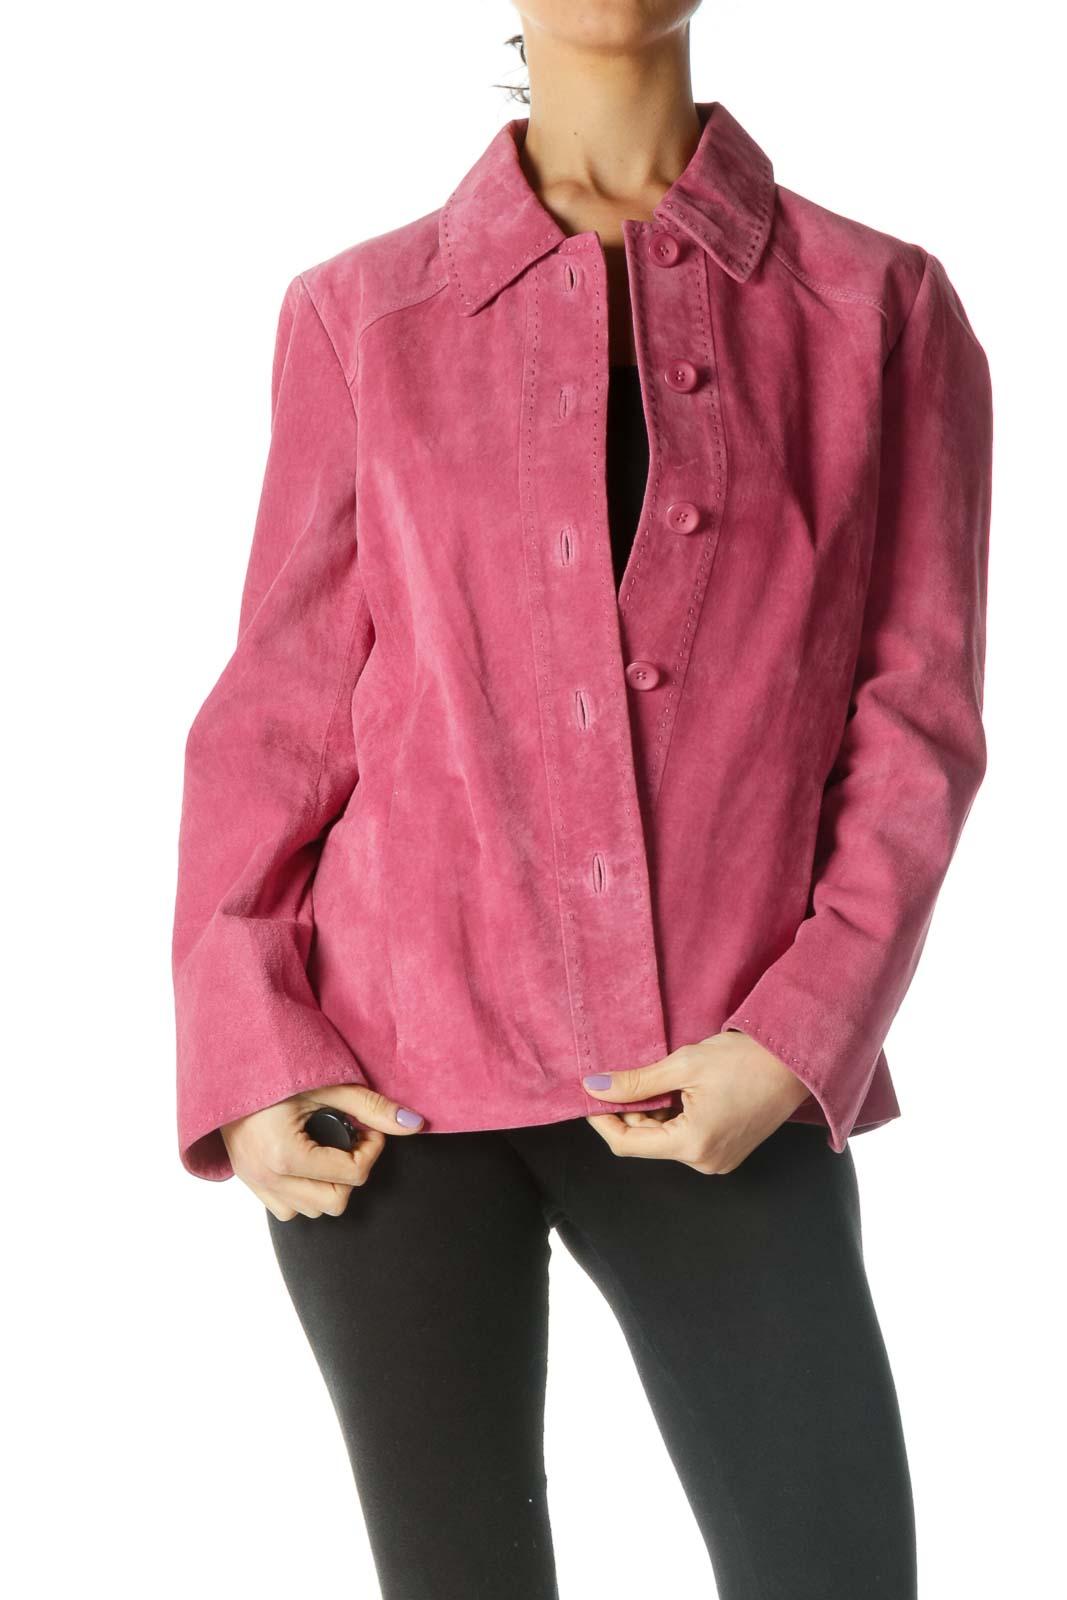 Pink Suede Jacket Front